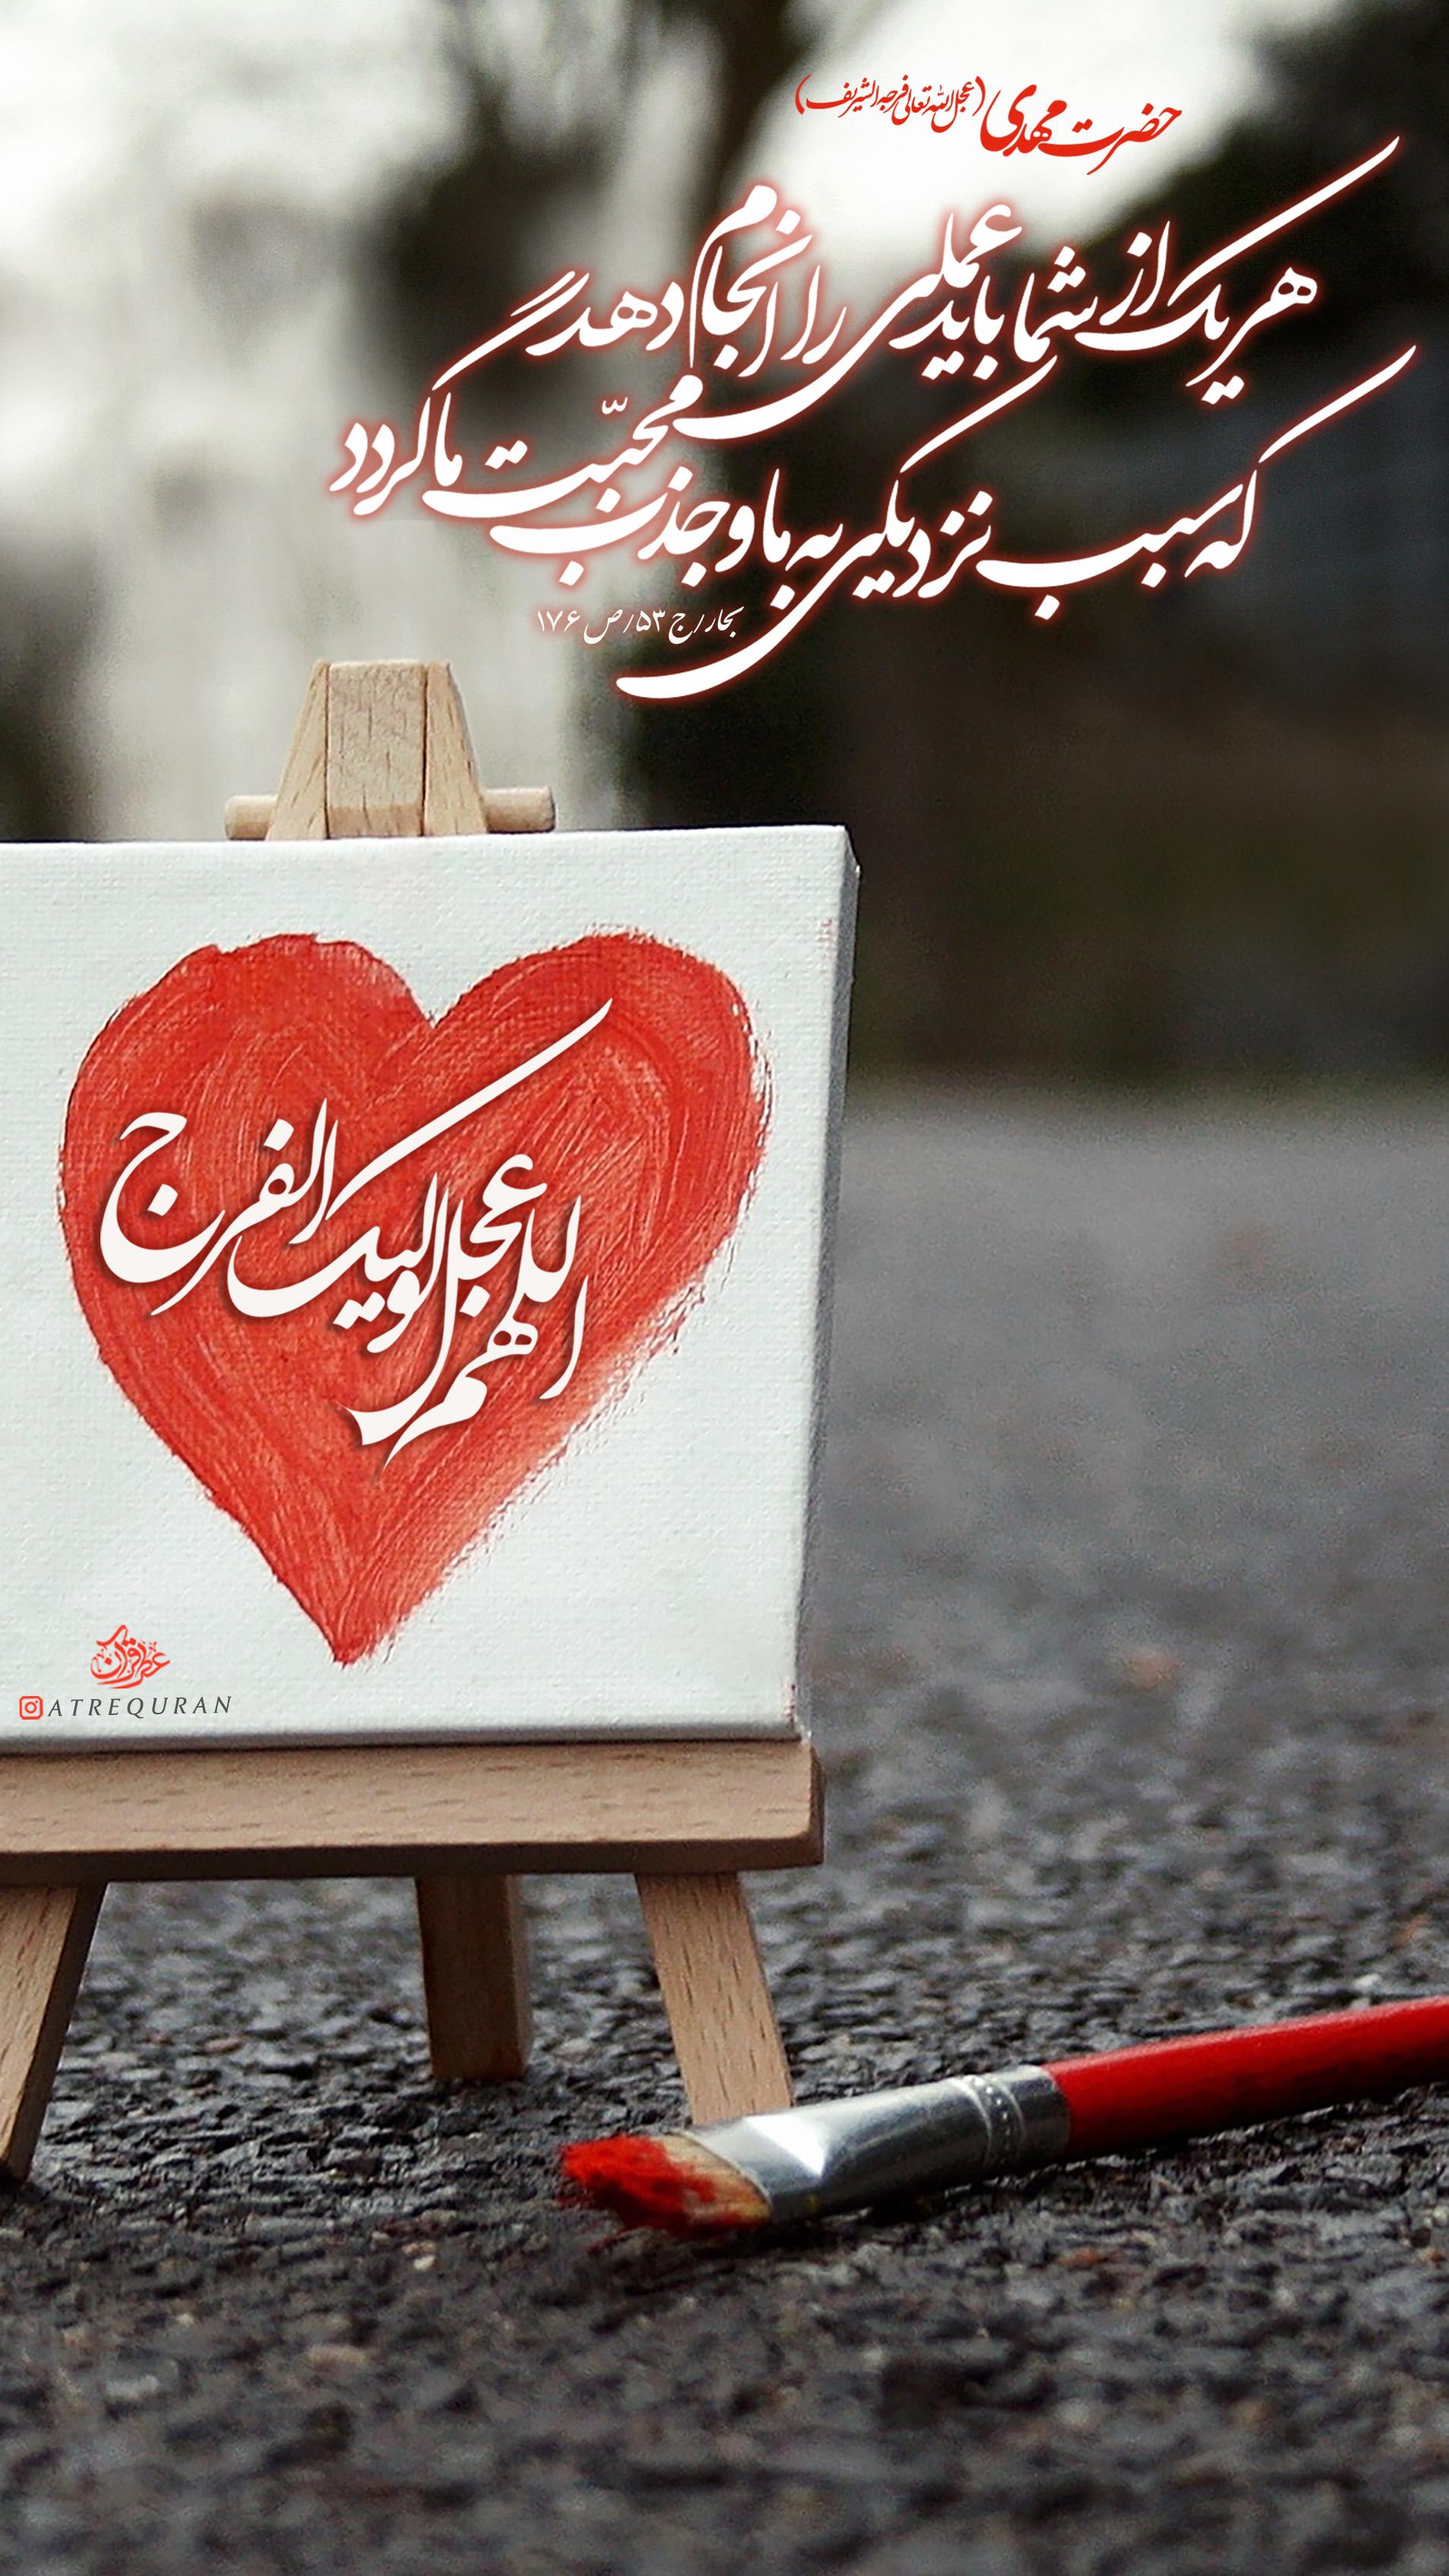 محبّت اهل بیت علیهم السلام